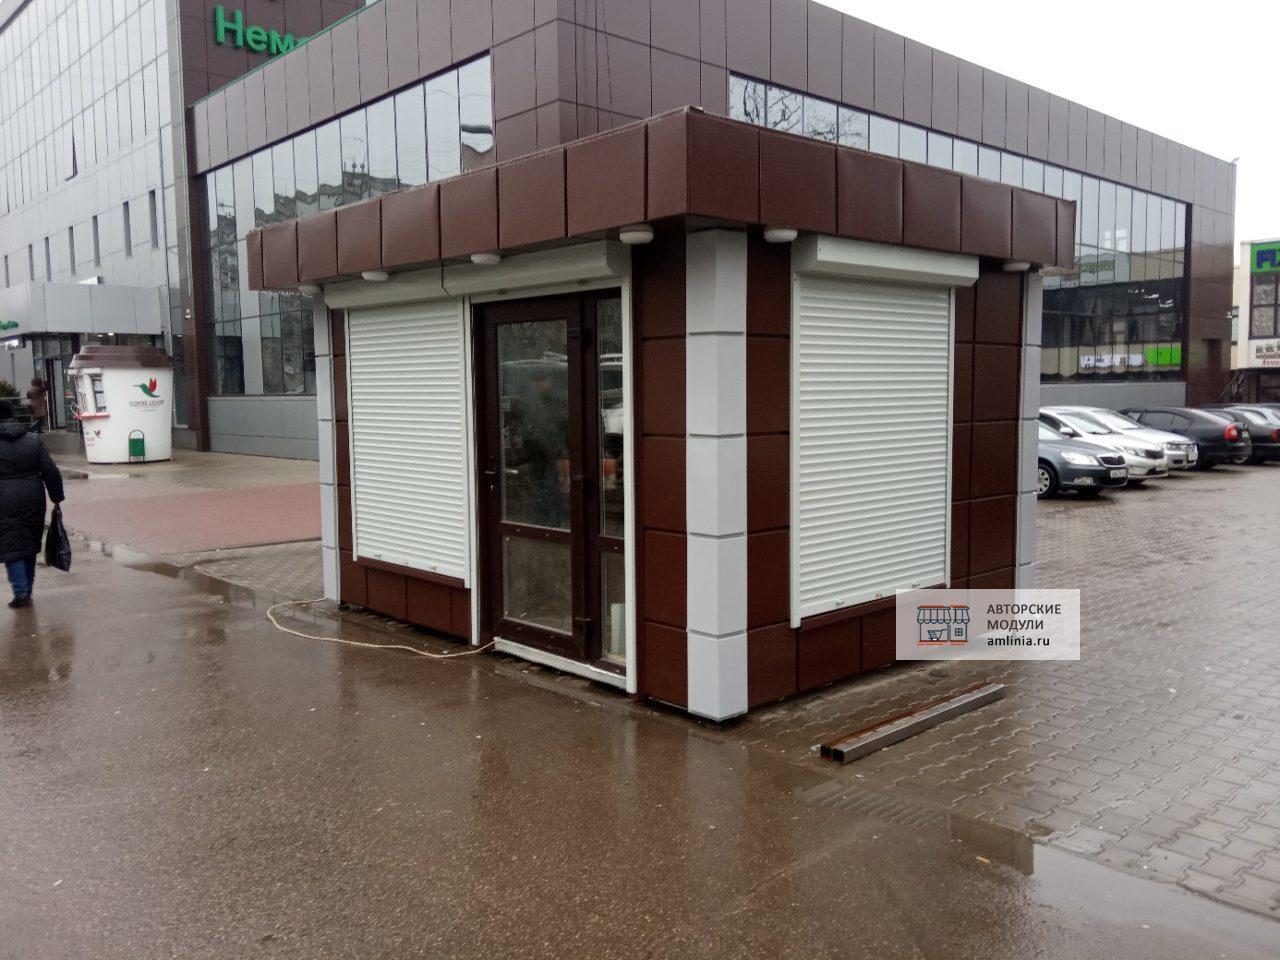 Павильон двухмодульный минимагазин, размеры 5,0 х 5,0 х 2,87 метра